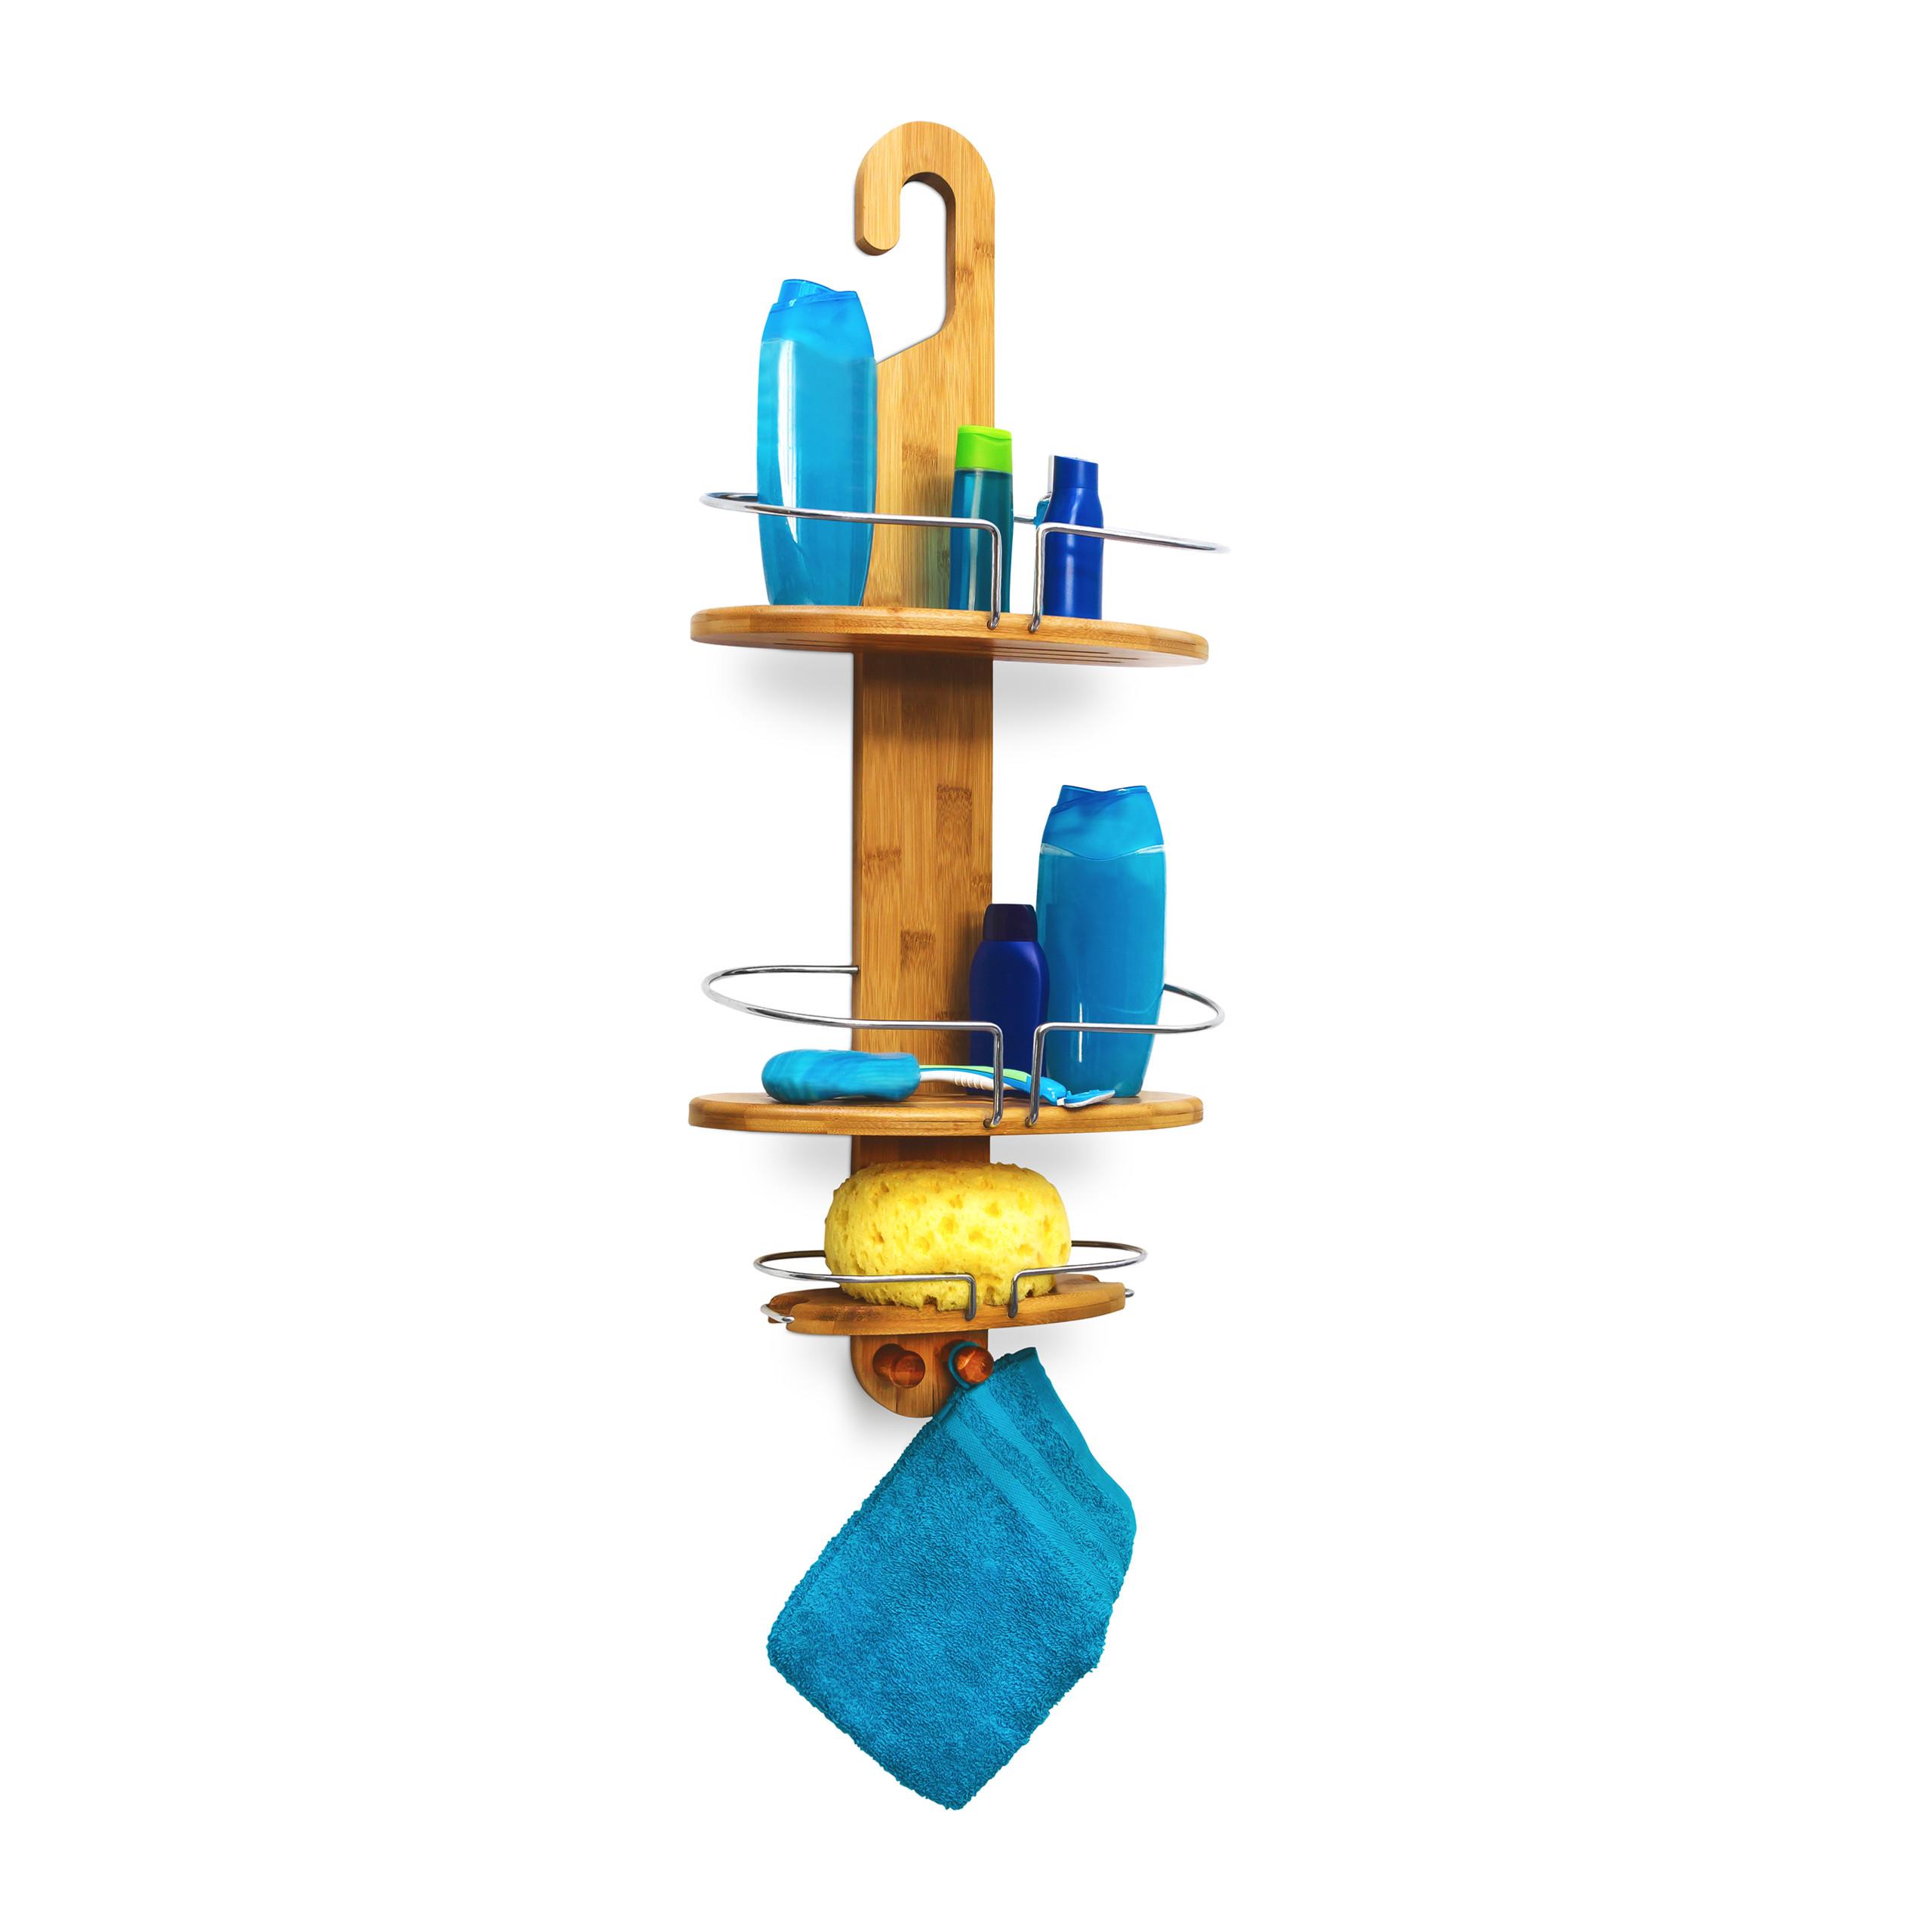 Estante-de-bano-colgante-ducha-bano-bambu-estanteria-para-servicio